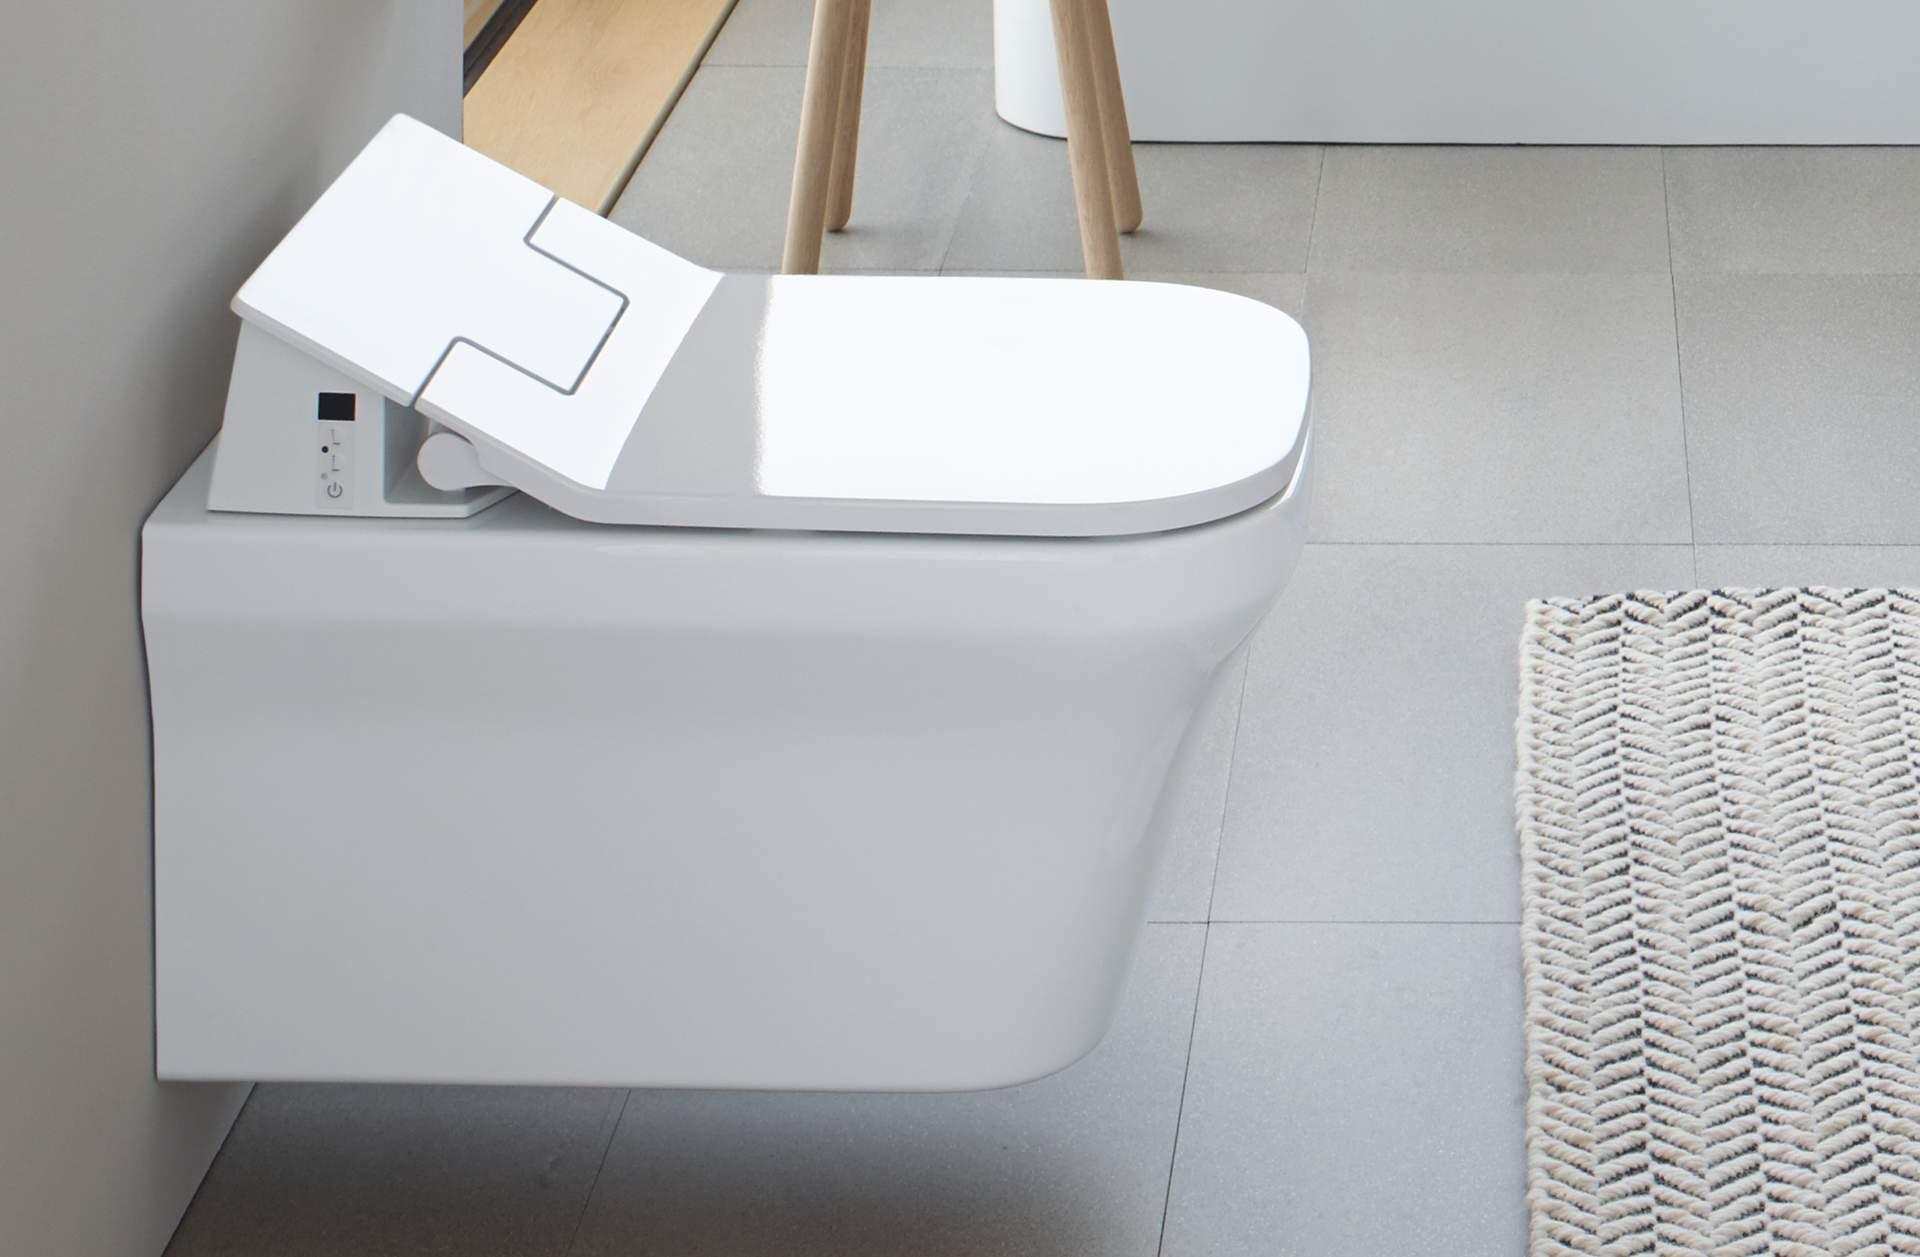 Duravit sensowash slim innovative shower toilets duravit - Duravit inodoros ...